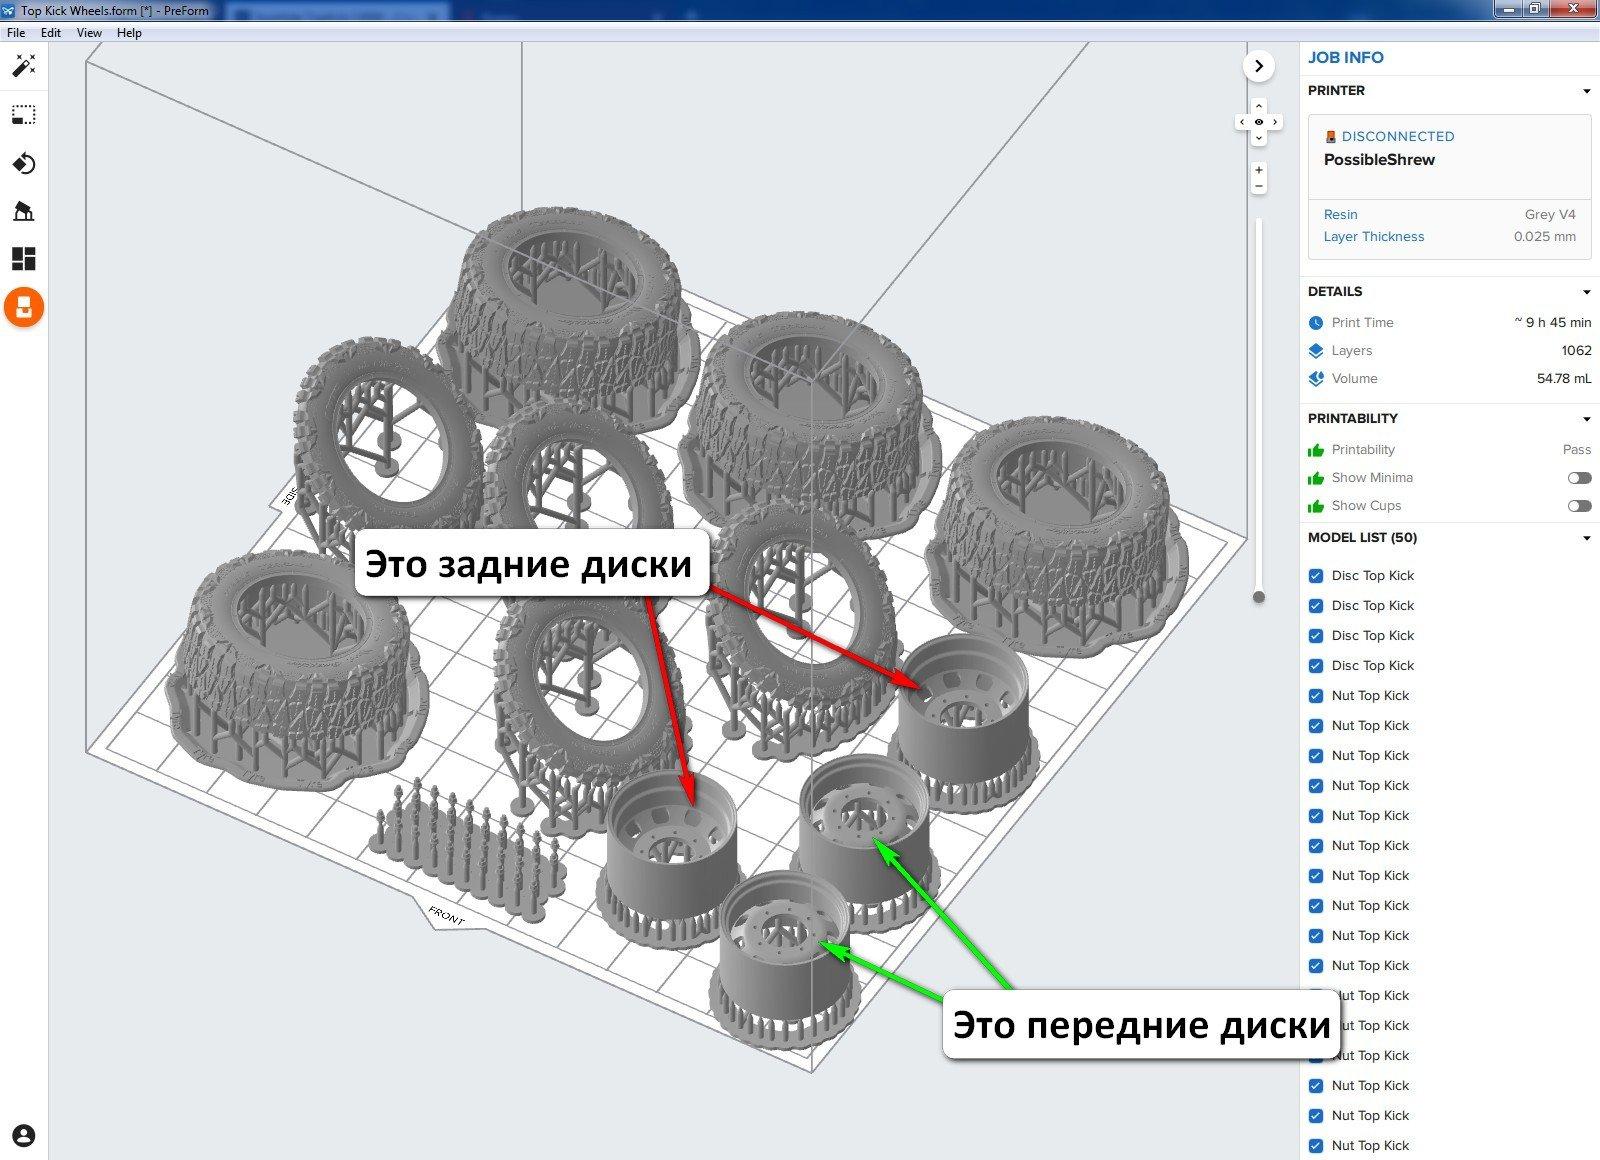 https://scalecustoms.ru/uploads/monthly_2020_08/2020-08-15_181057.jpg.658def5858c7319bec01e70c0b57436e.jpg